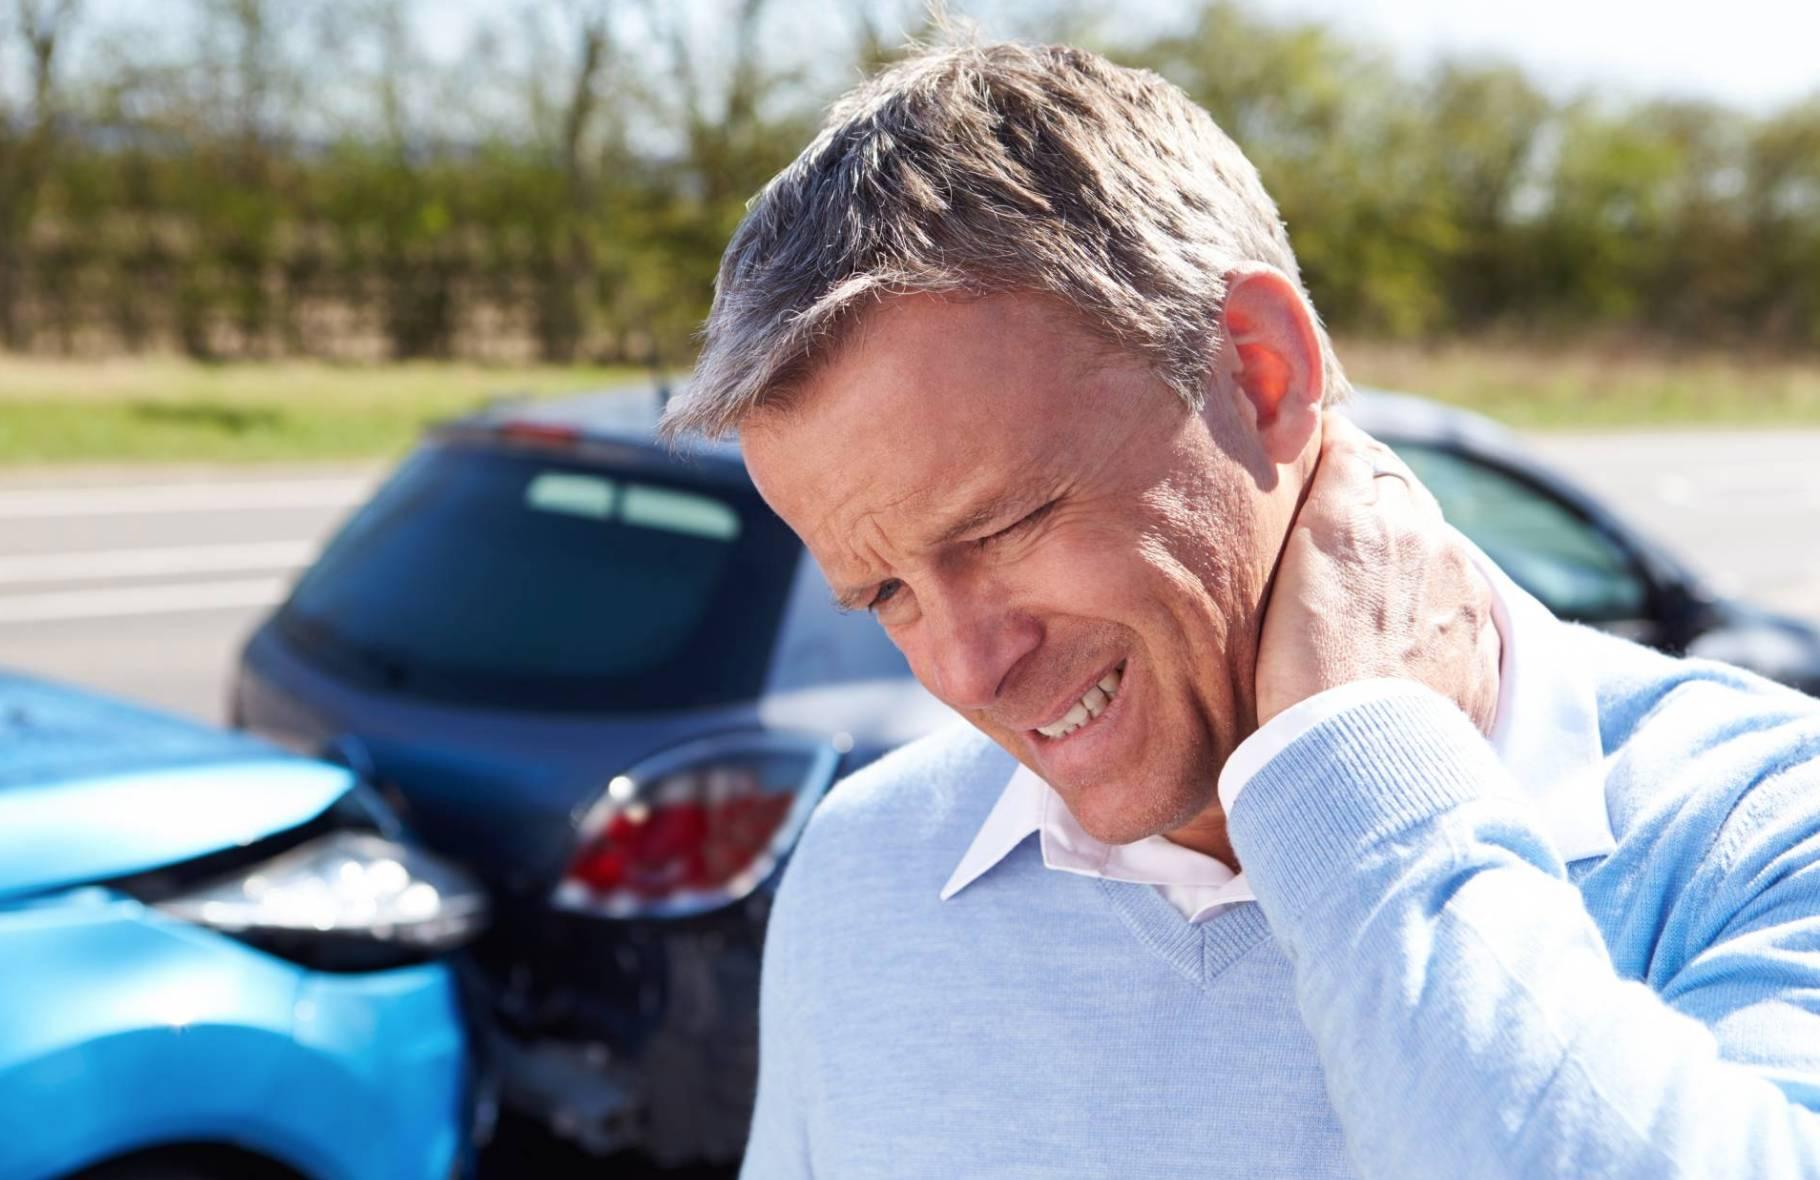 Best Stockbridge personal injury lawyers